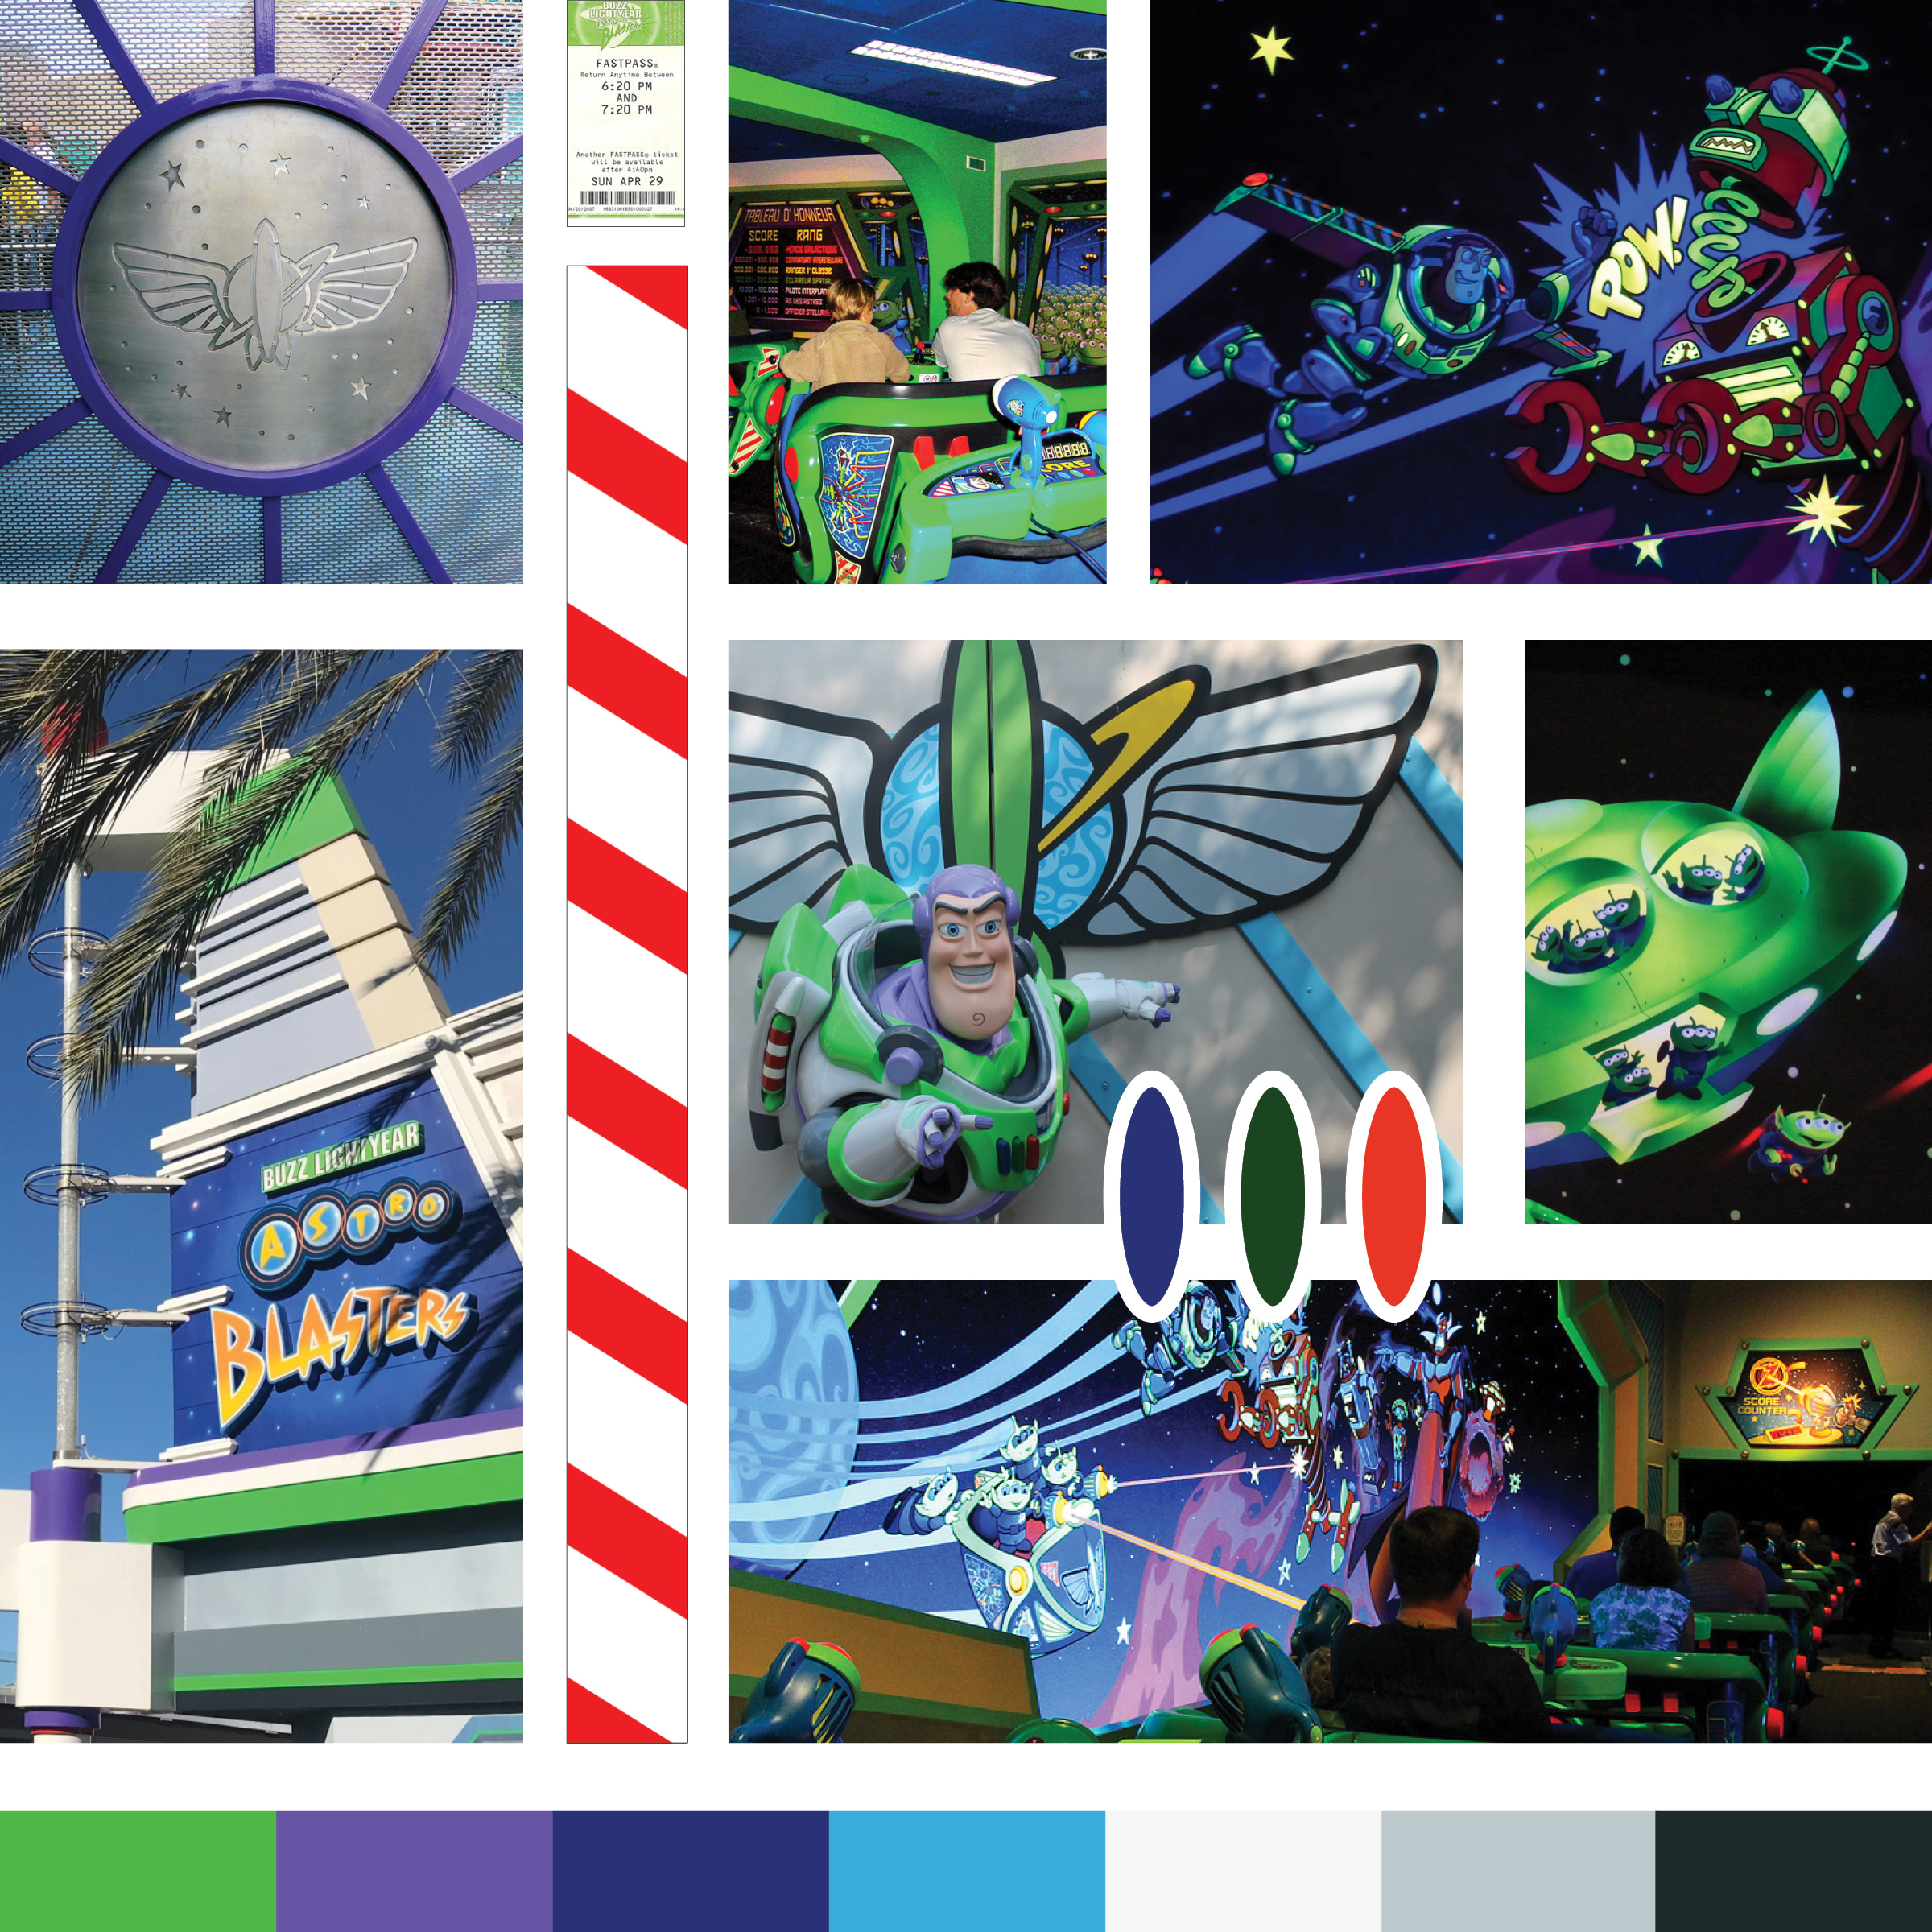 Buzz-Lightyear-moodboard-disney